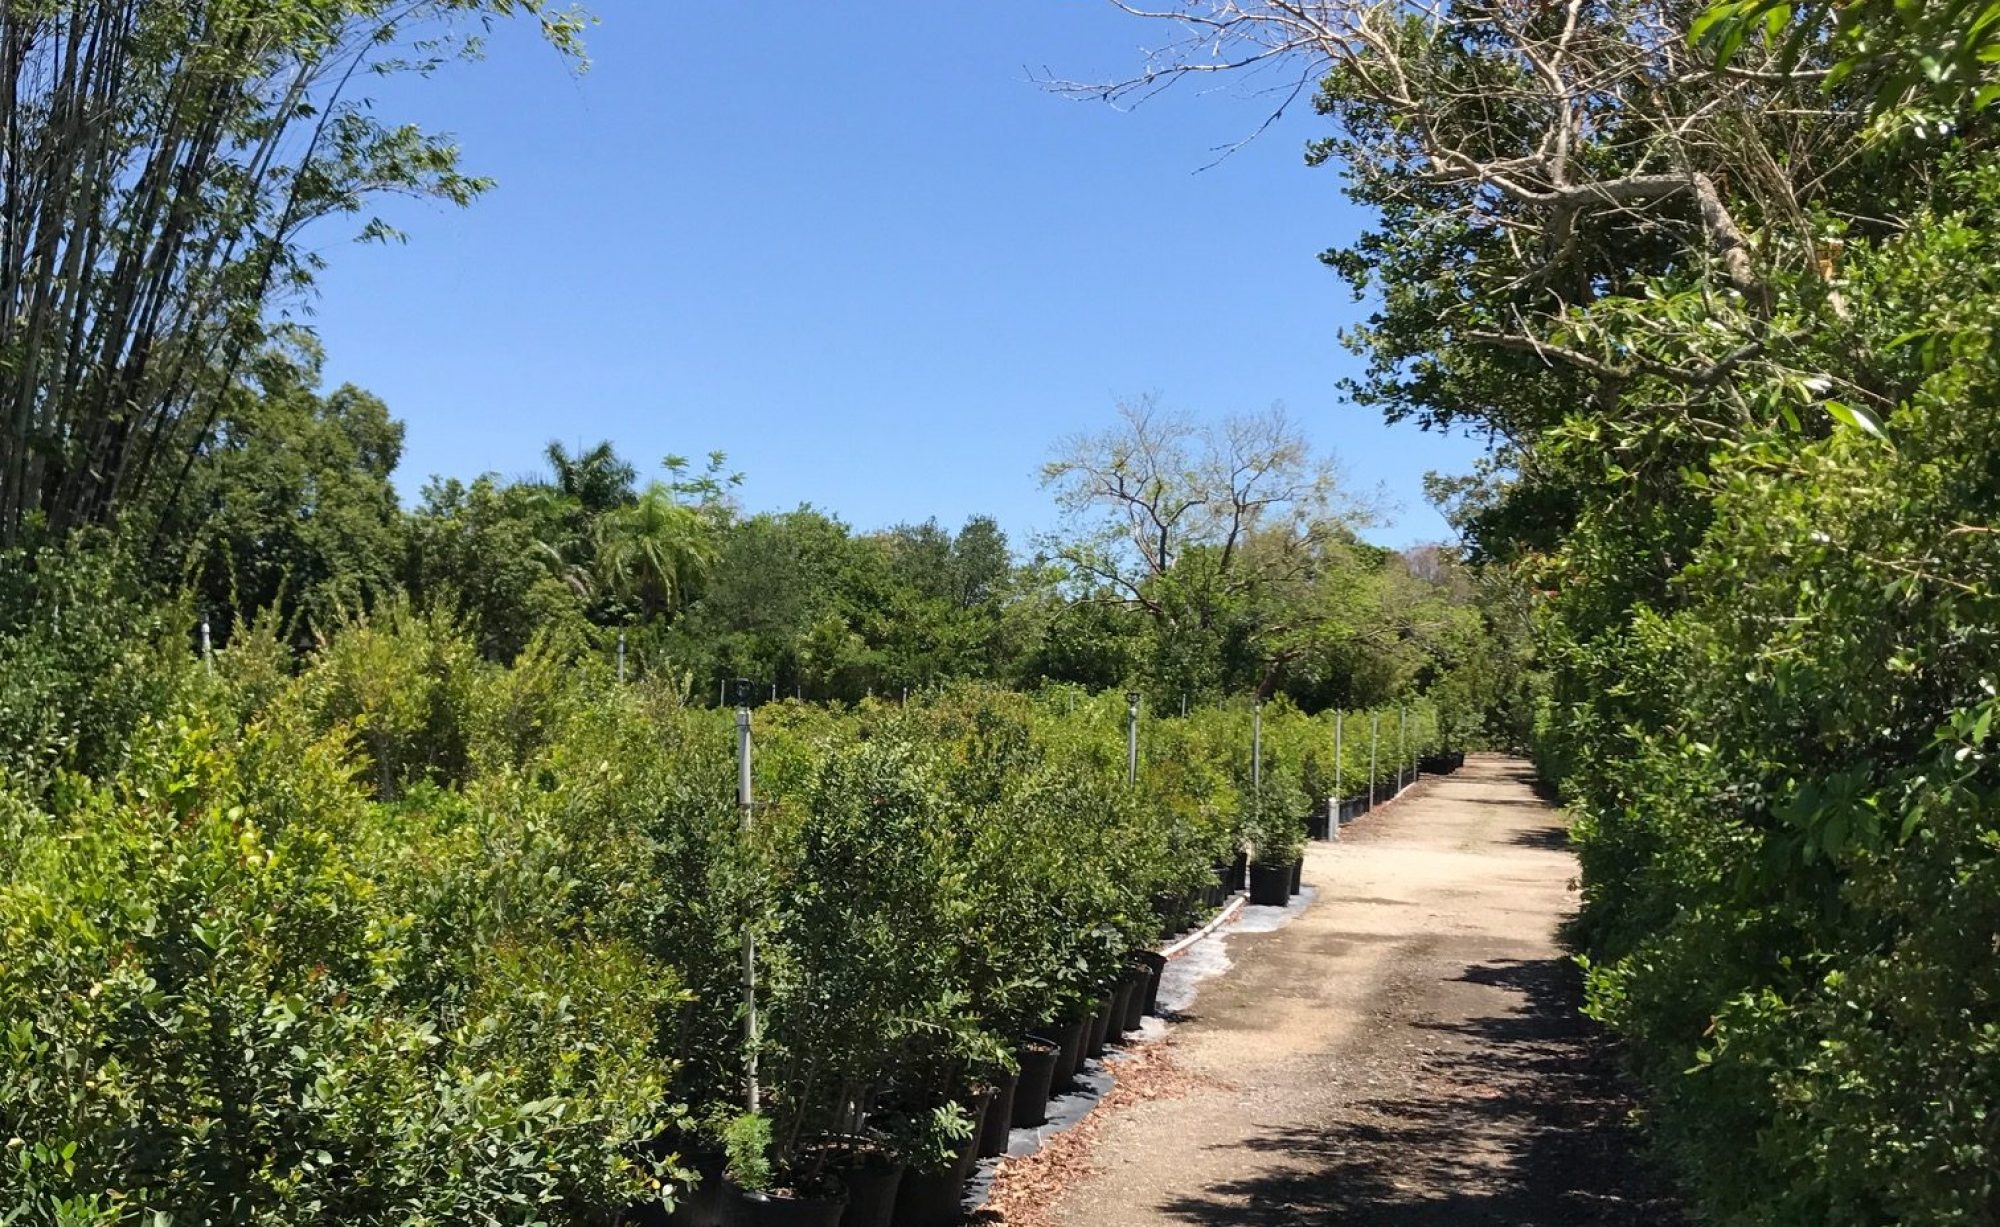 Kelly's Tropical Plants, LLC